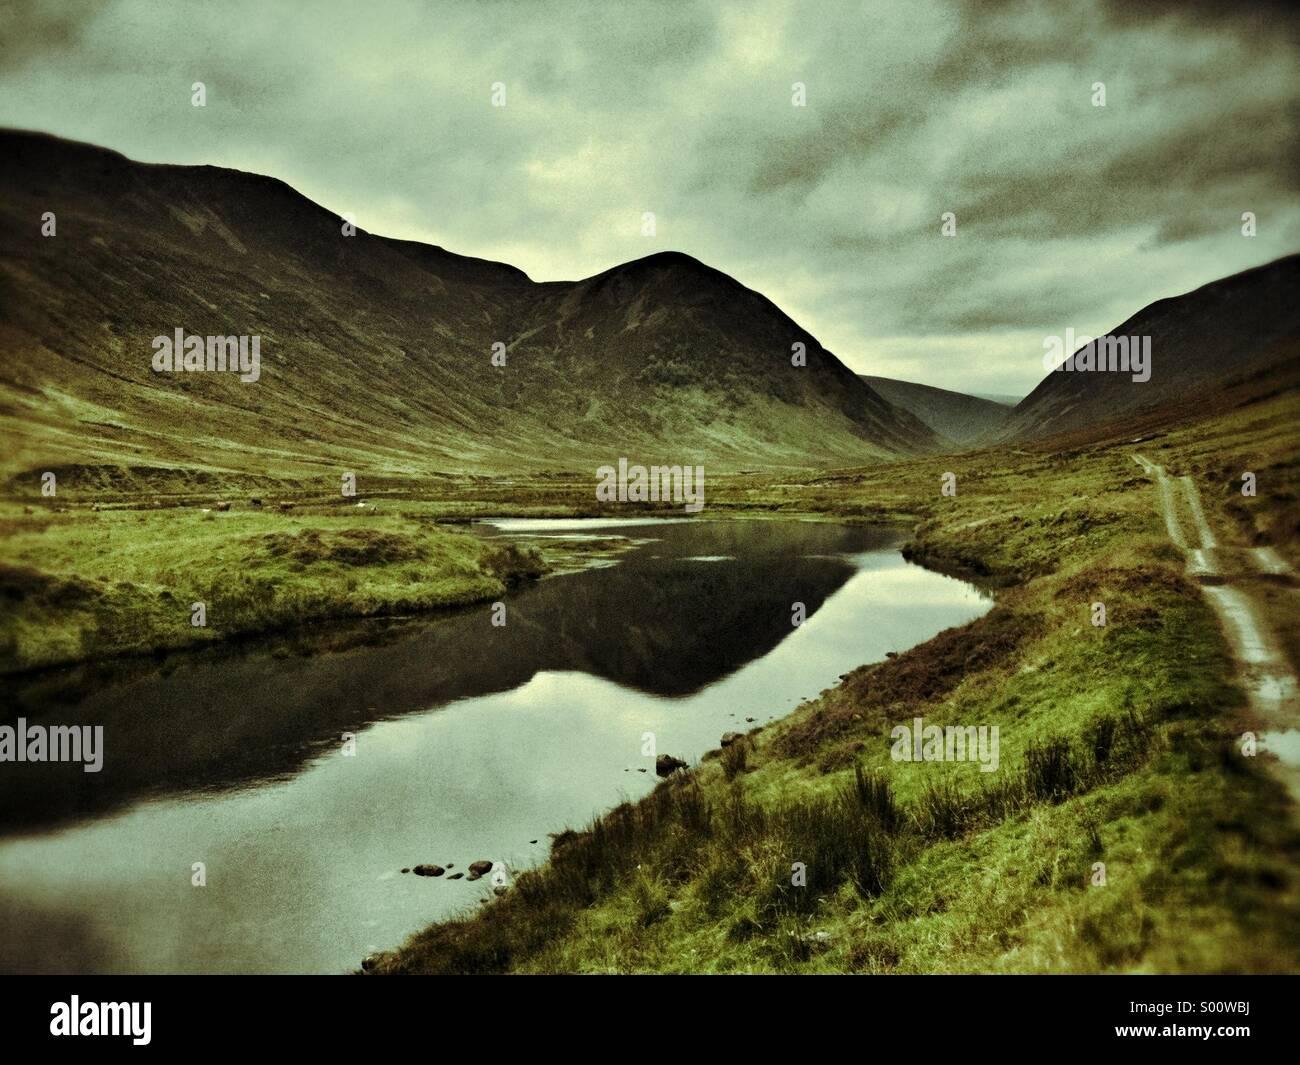 Glen Rothy, Scotland - Stock Image